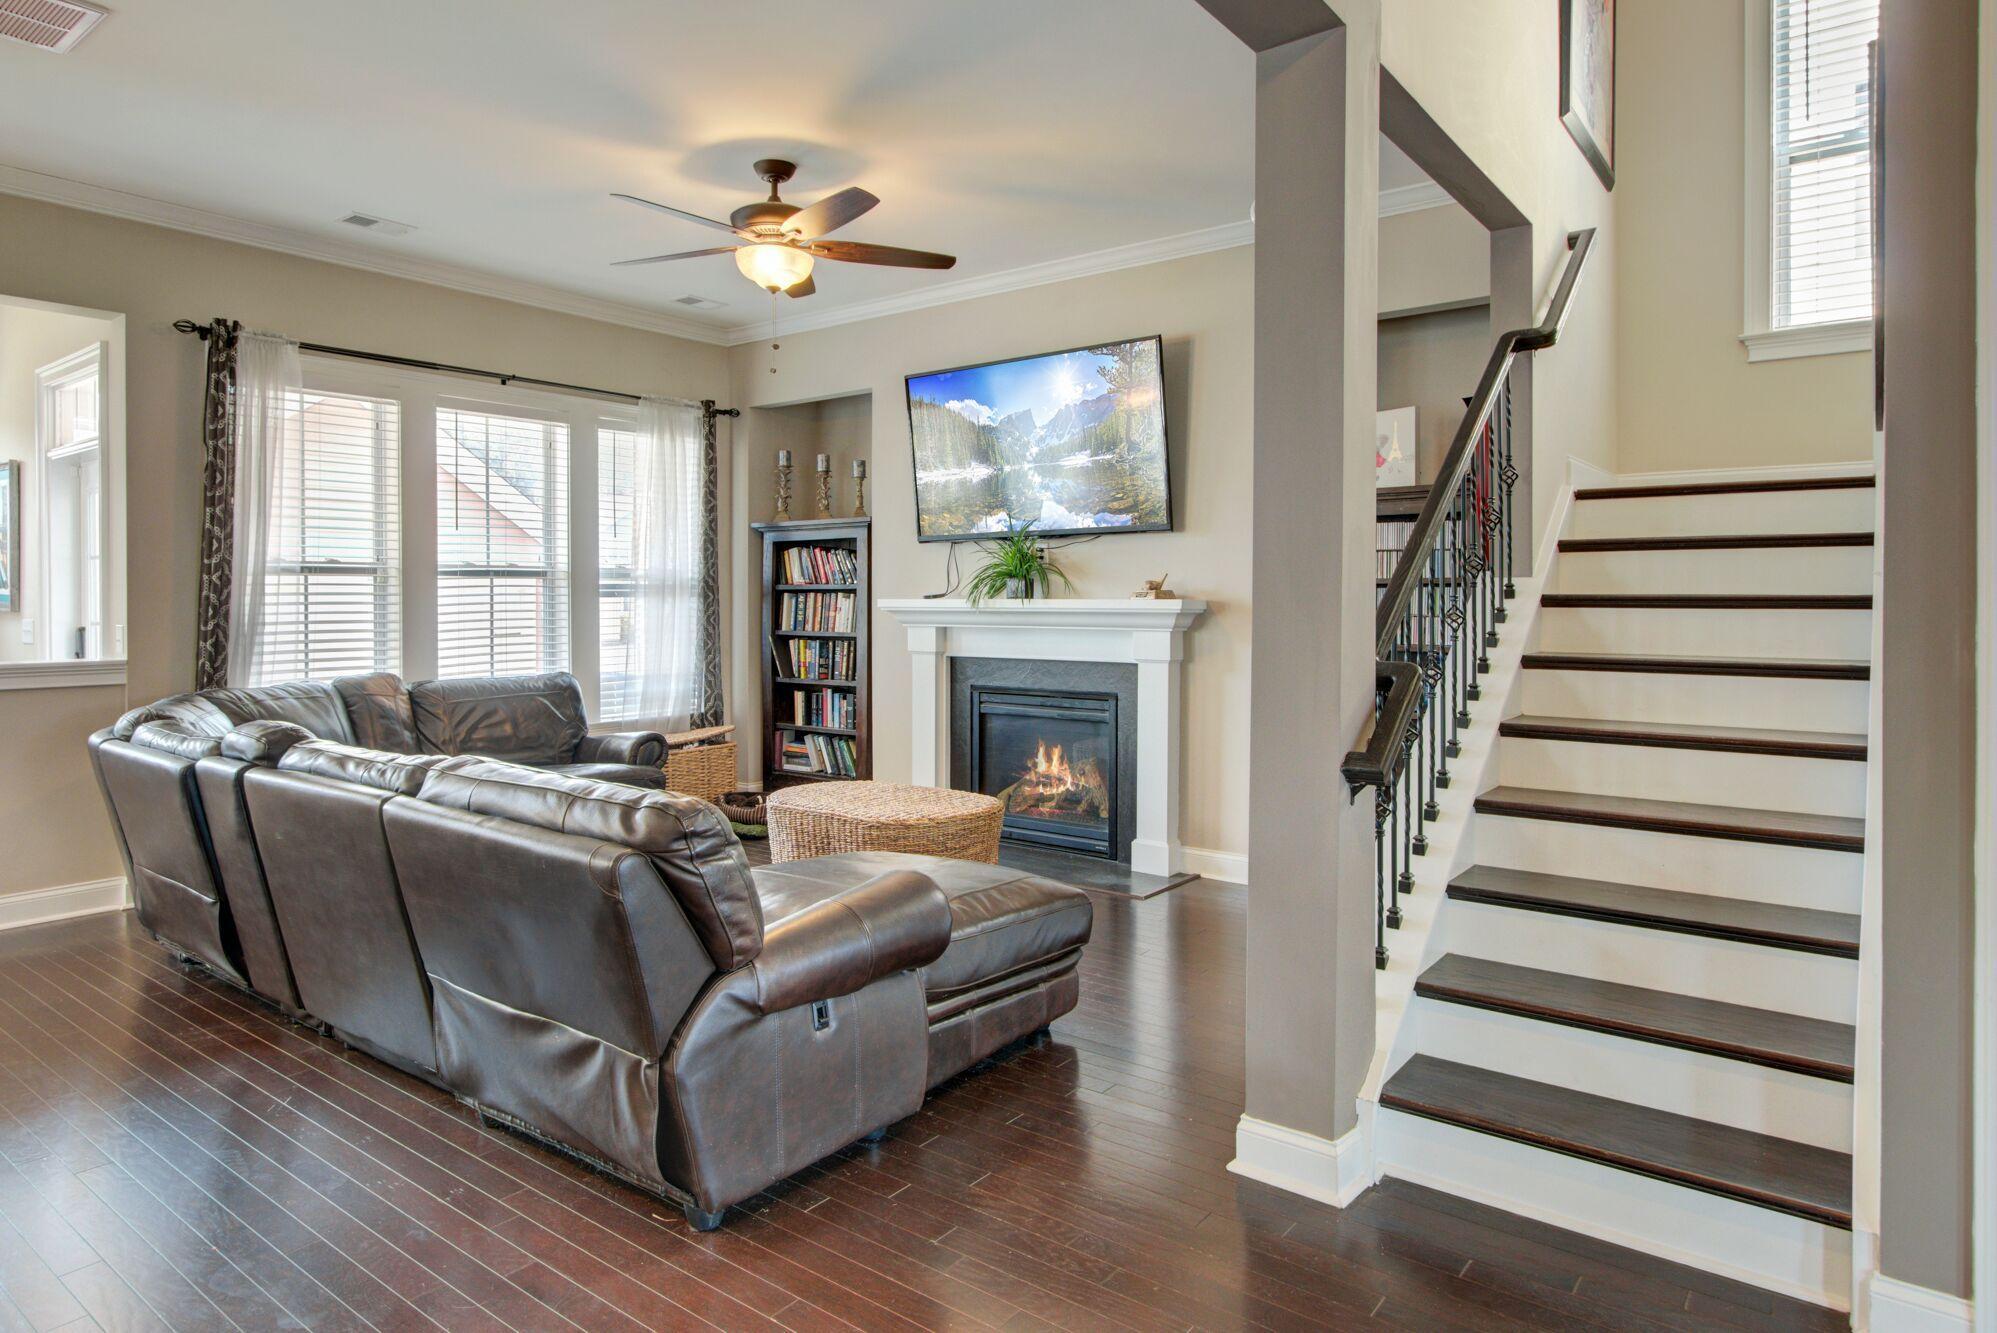 Carolina Park Homes For Sale - 3614 Shutesbury, Mount Pleasant, SC - 33